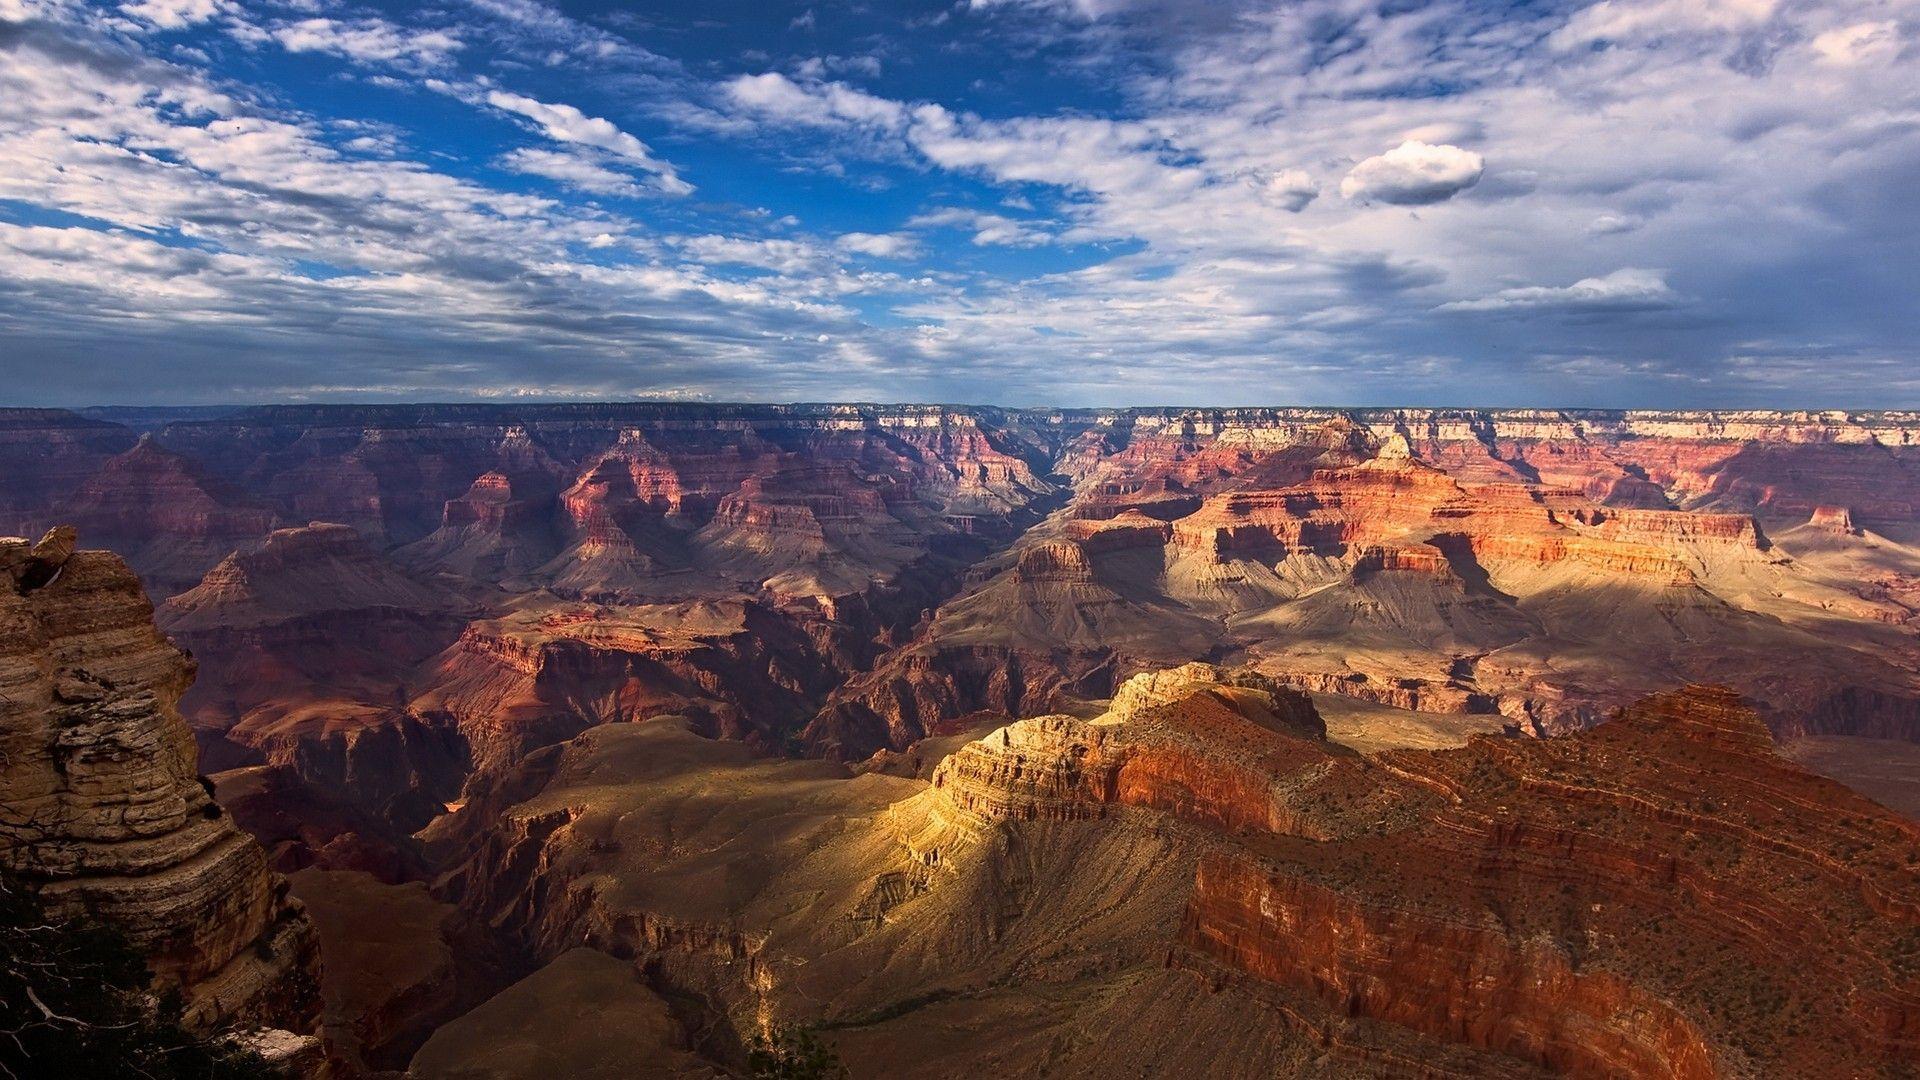 grand canyon 1920x1080 wallpaper - photo #1